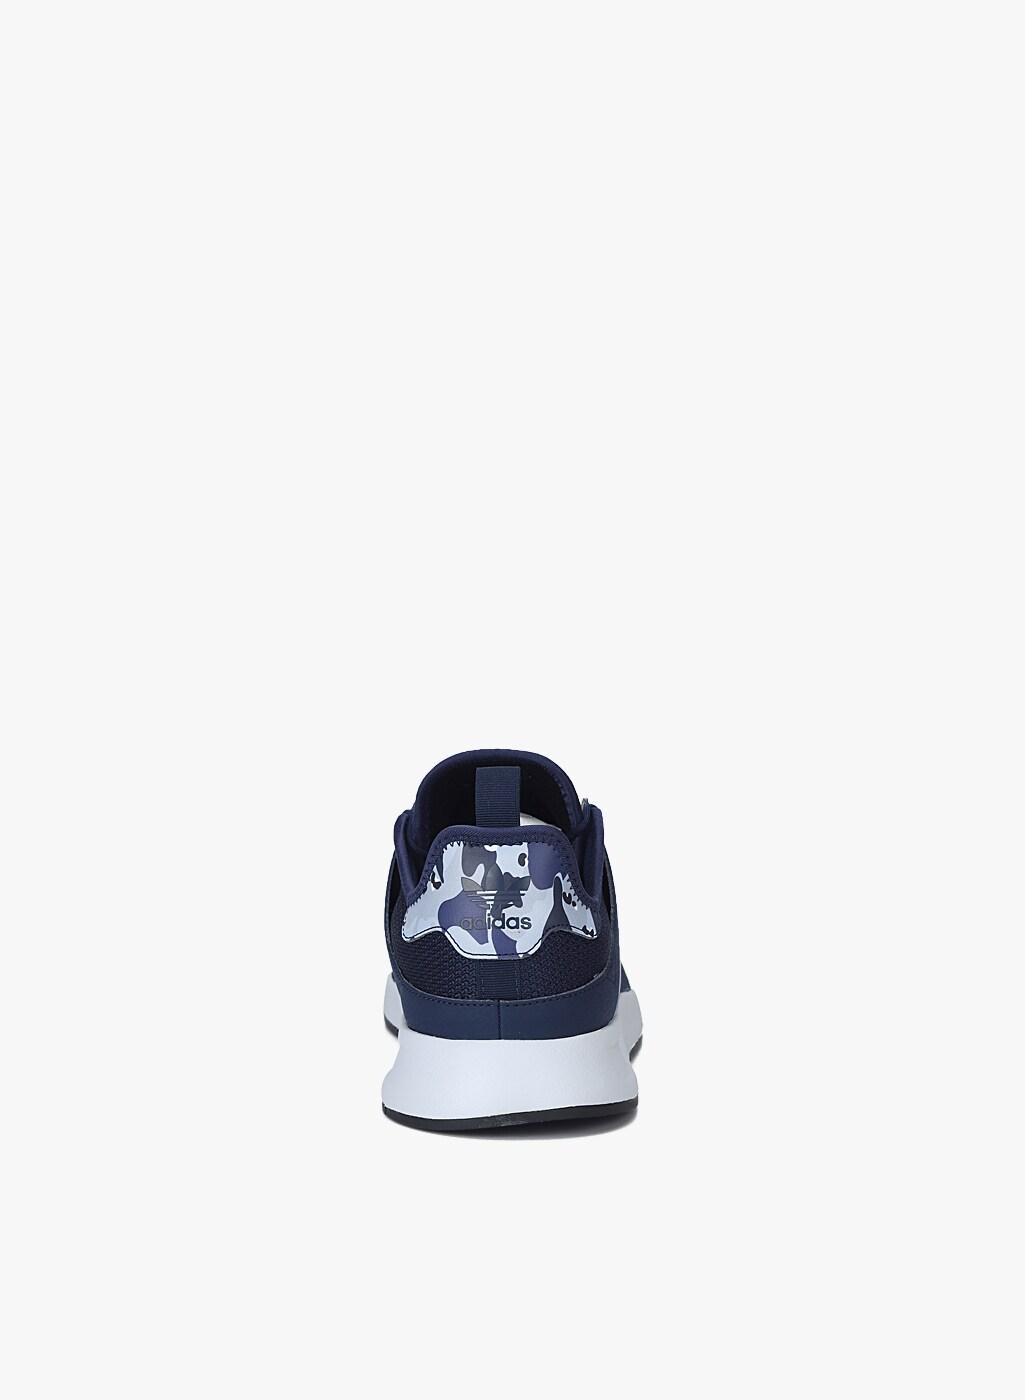 6aba67867cd034 Brown Navy Blue Blue Men Shoes Adidas Originals - Buy Brown Navy Blue Blue  Men Shoes Adidas Originals online in India - Jabong